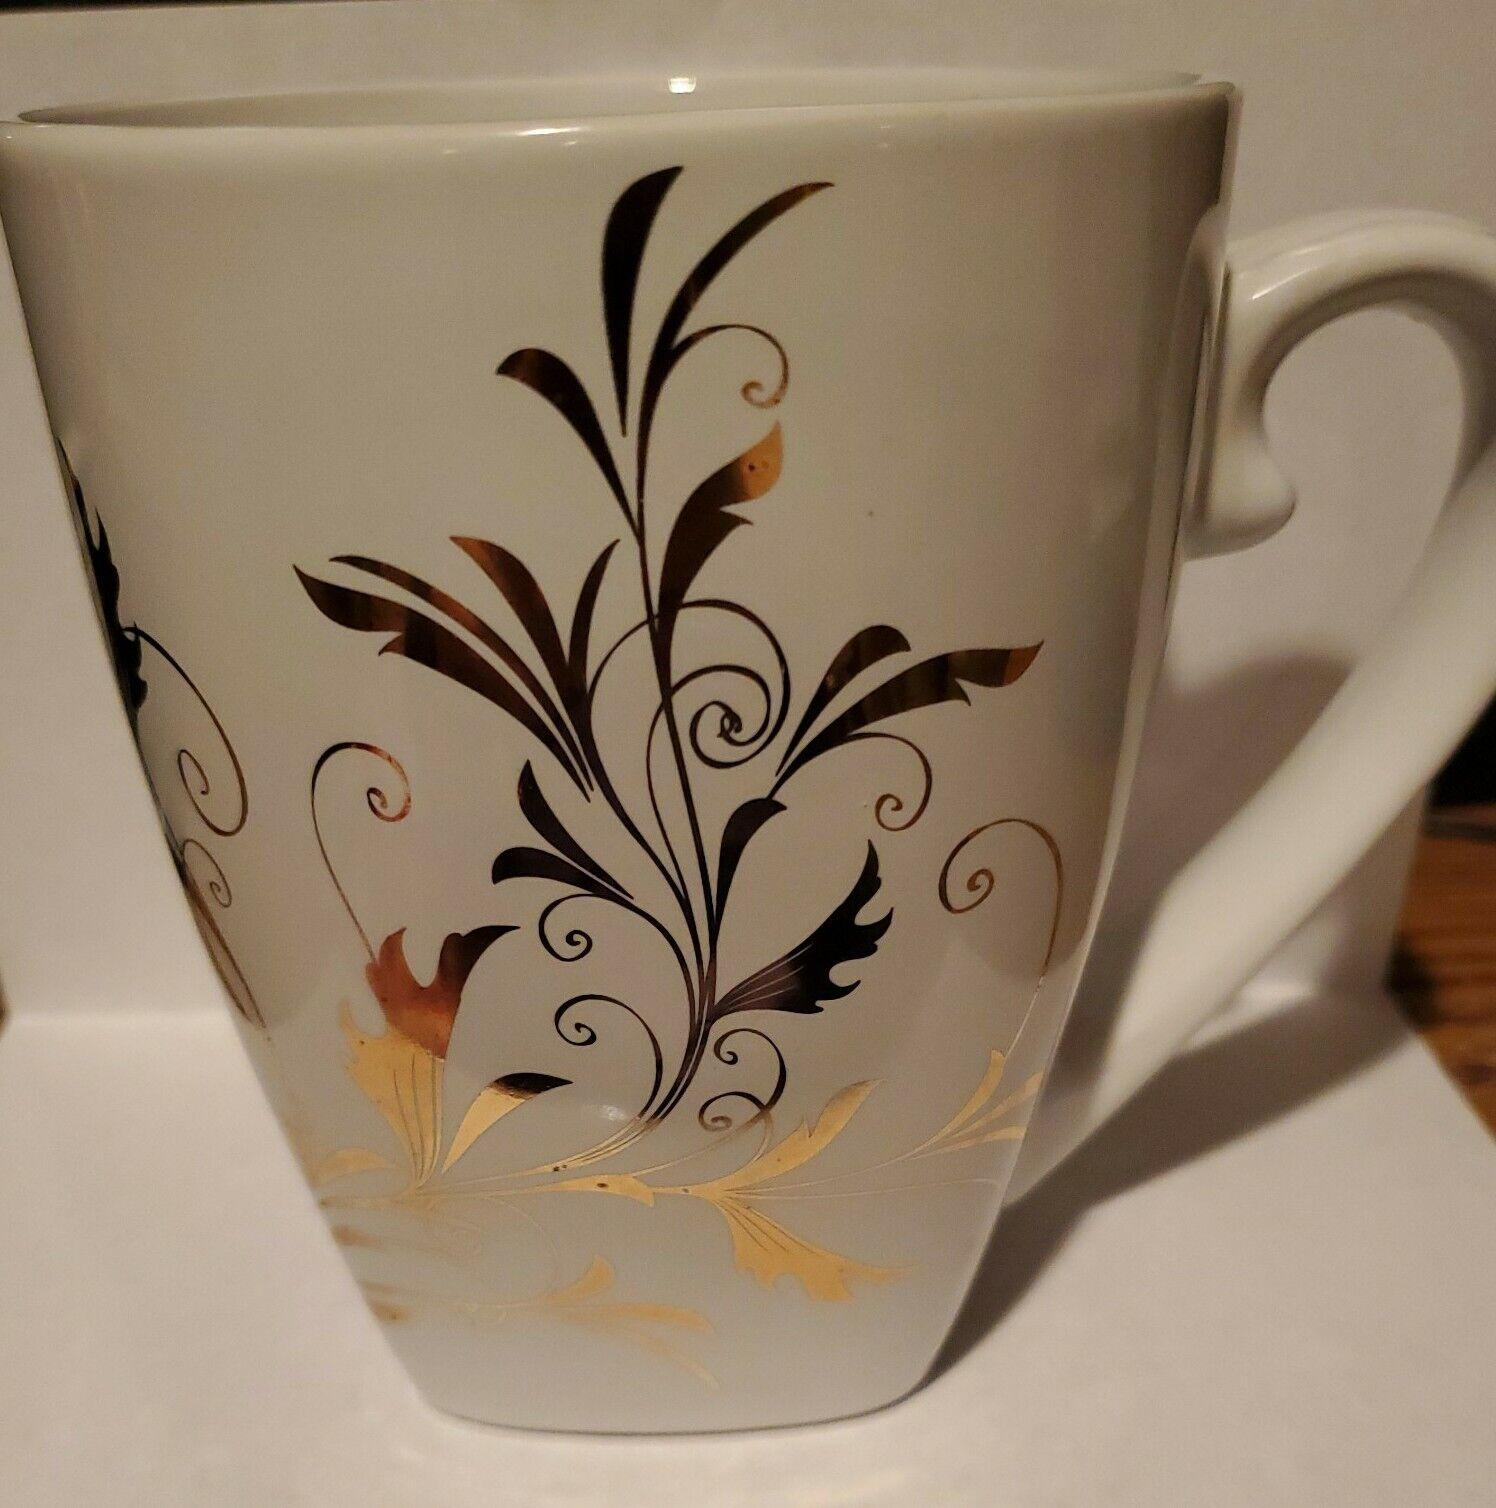 Skyrim 20oz Coffee Mug With Foil Print